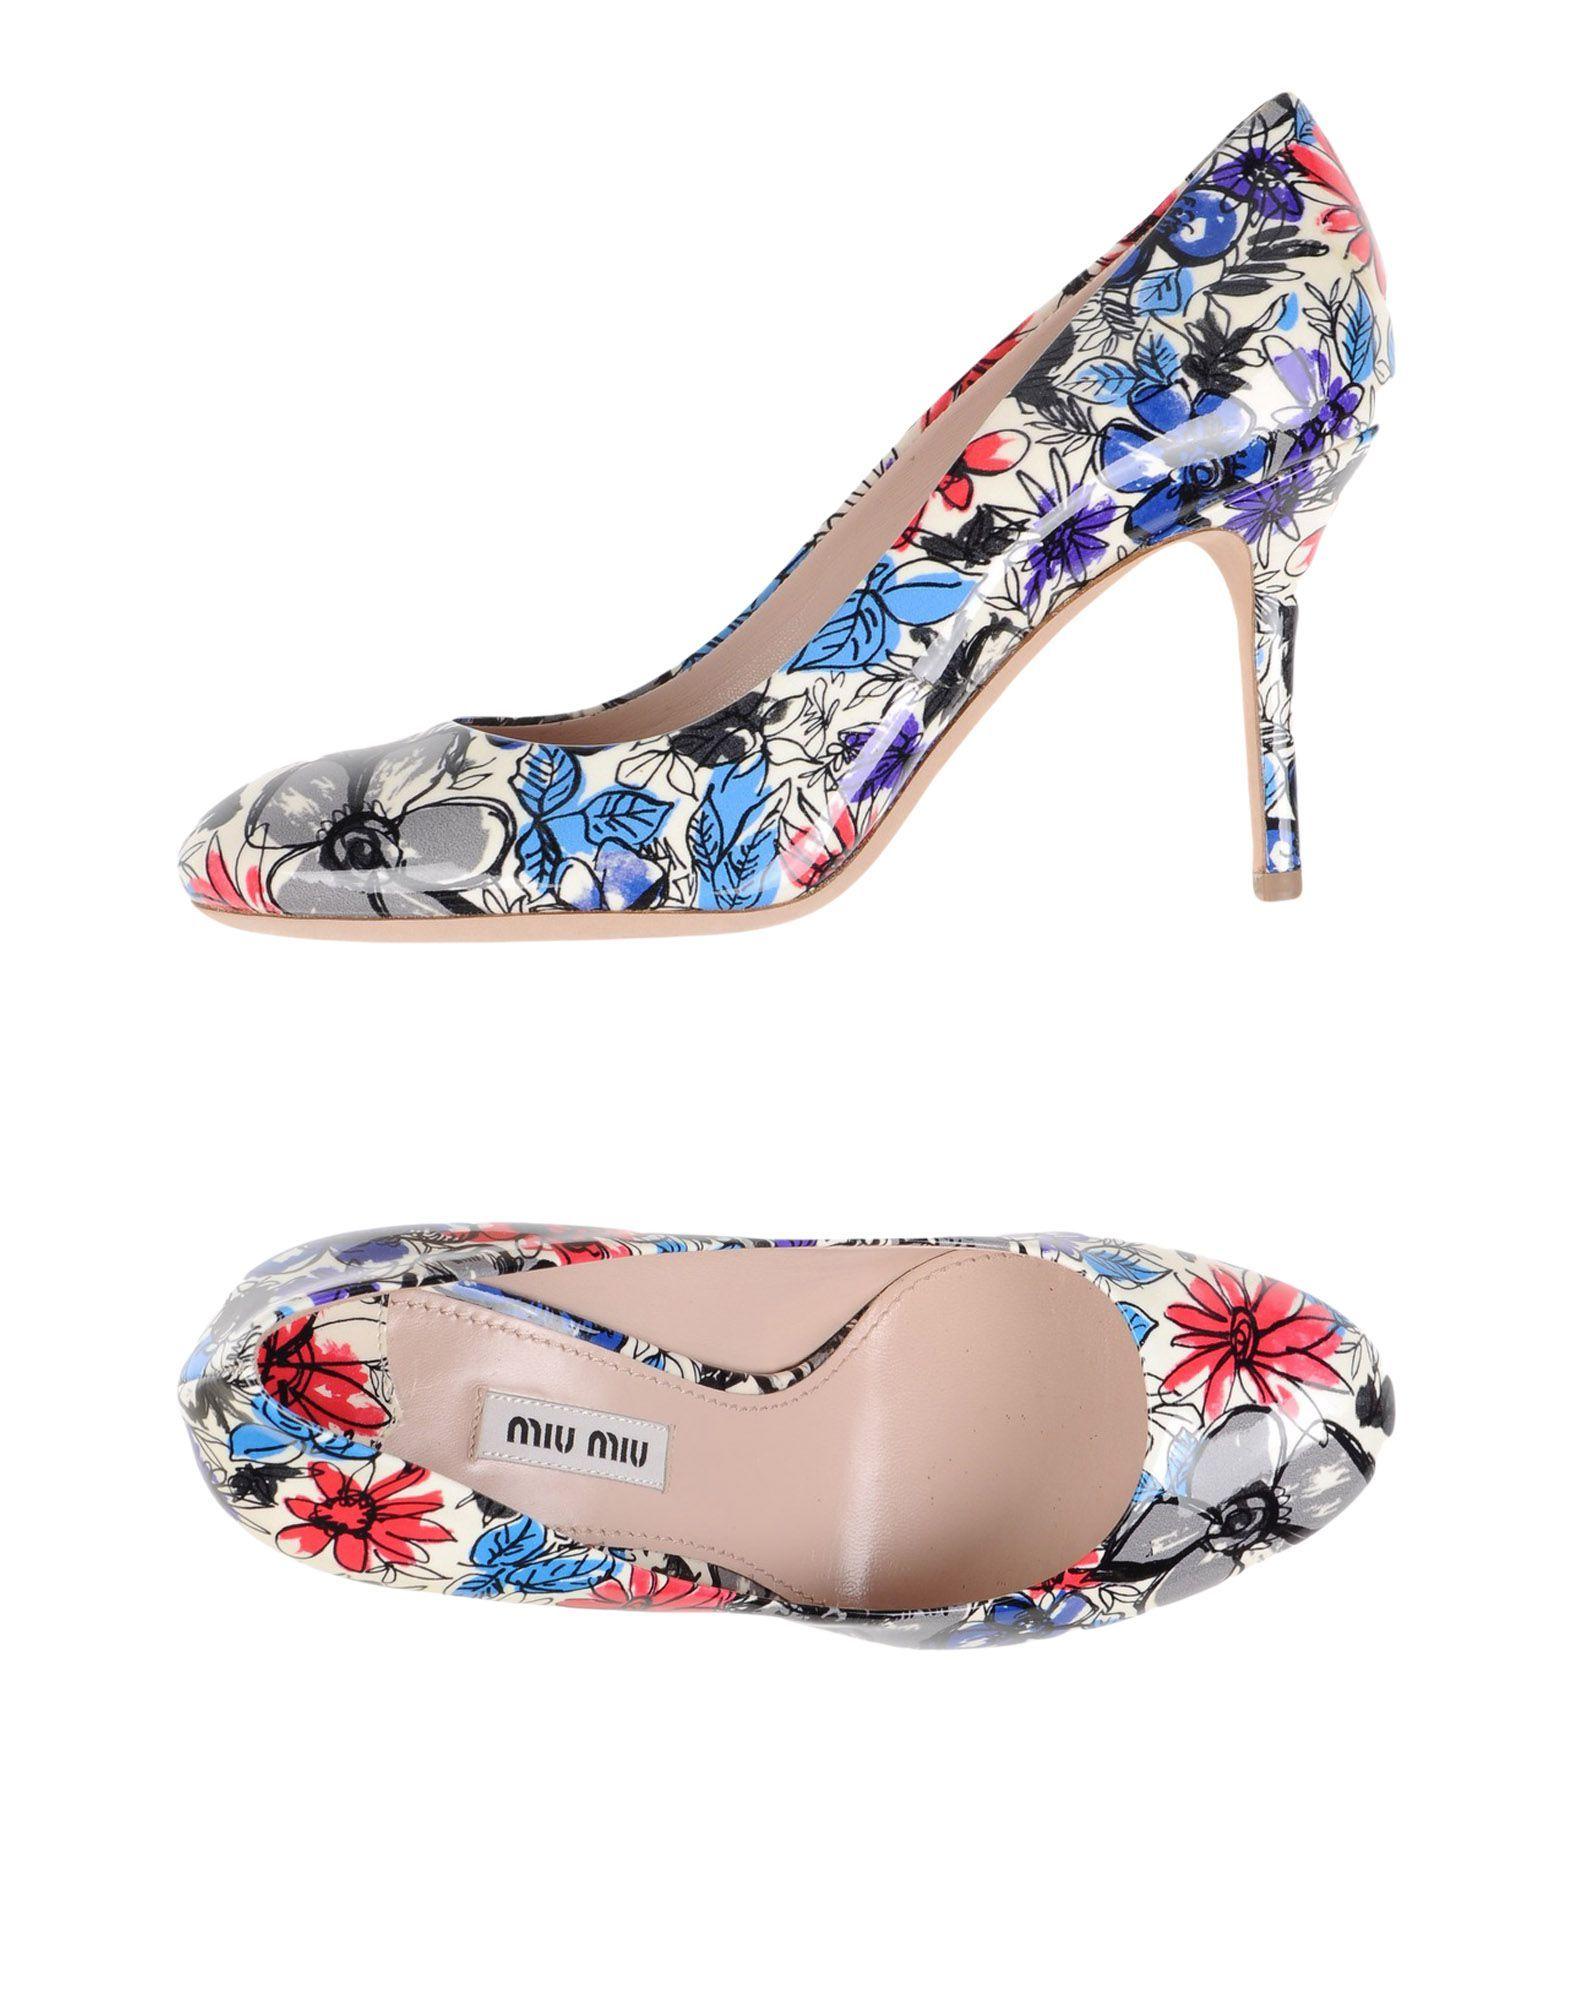 ef0060b5 zapatos marypaz mujer, zapatos marypaz 2019, zapatos marypaz de fiesta, zapatos  marypaz outlet